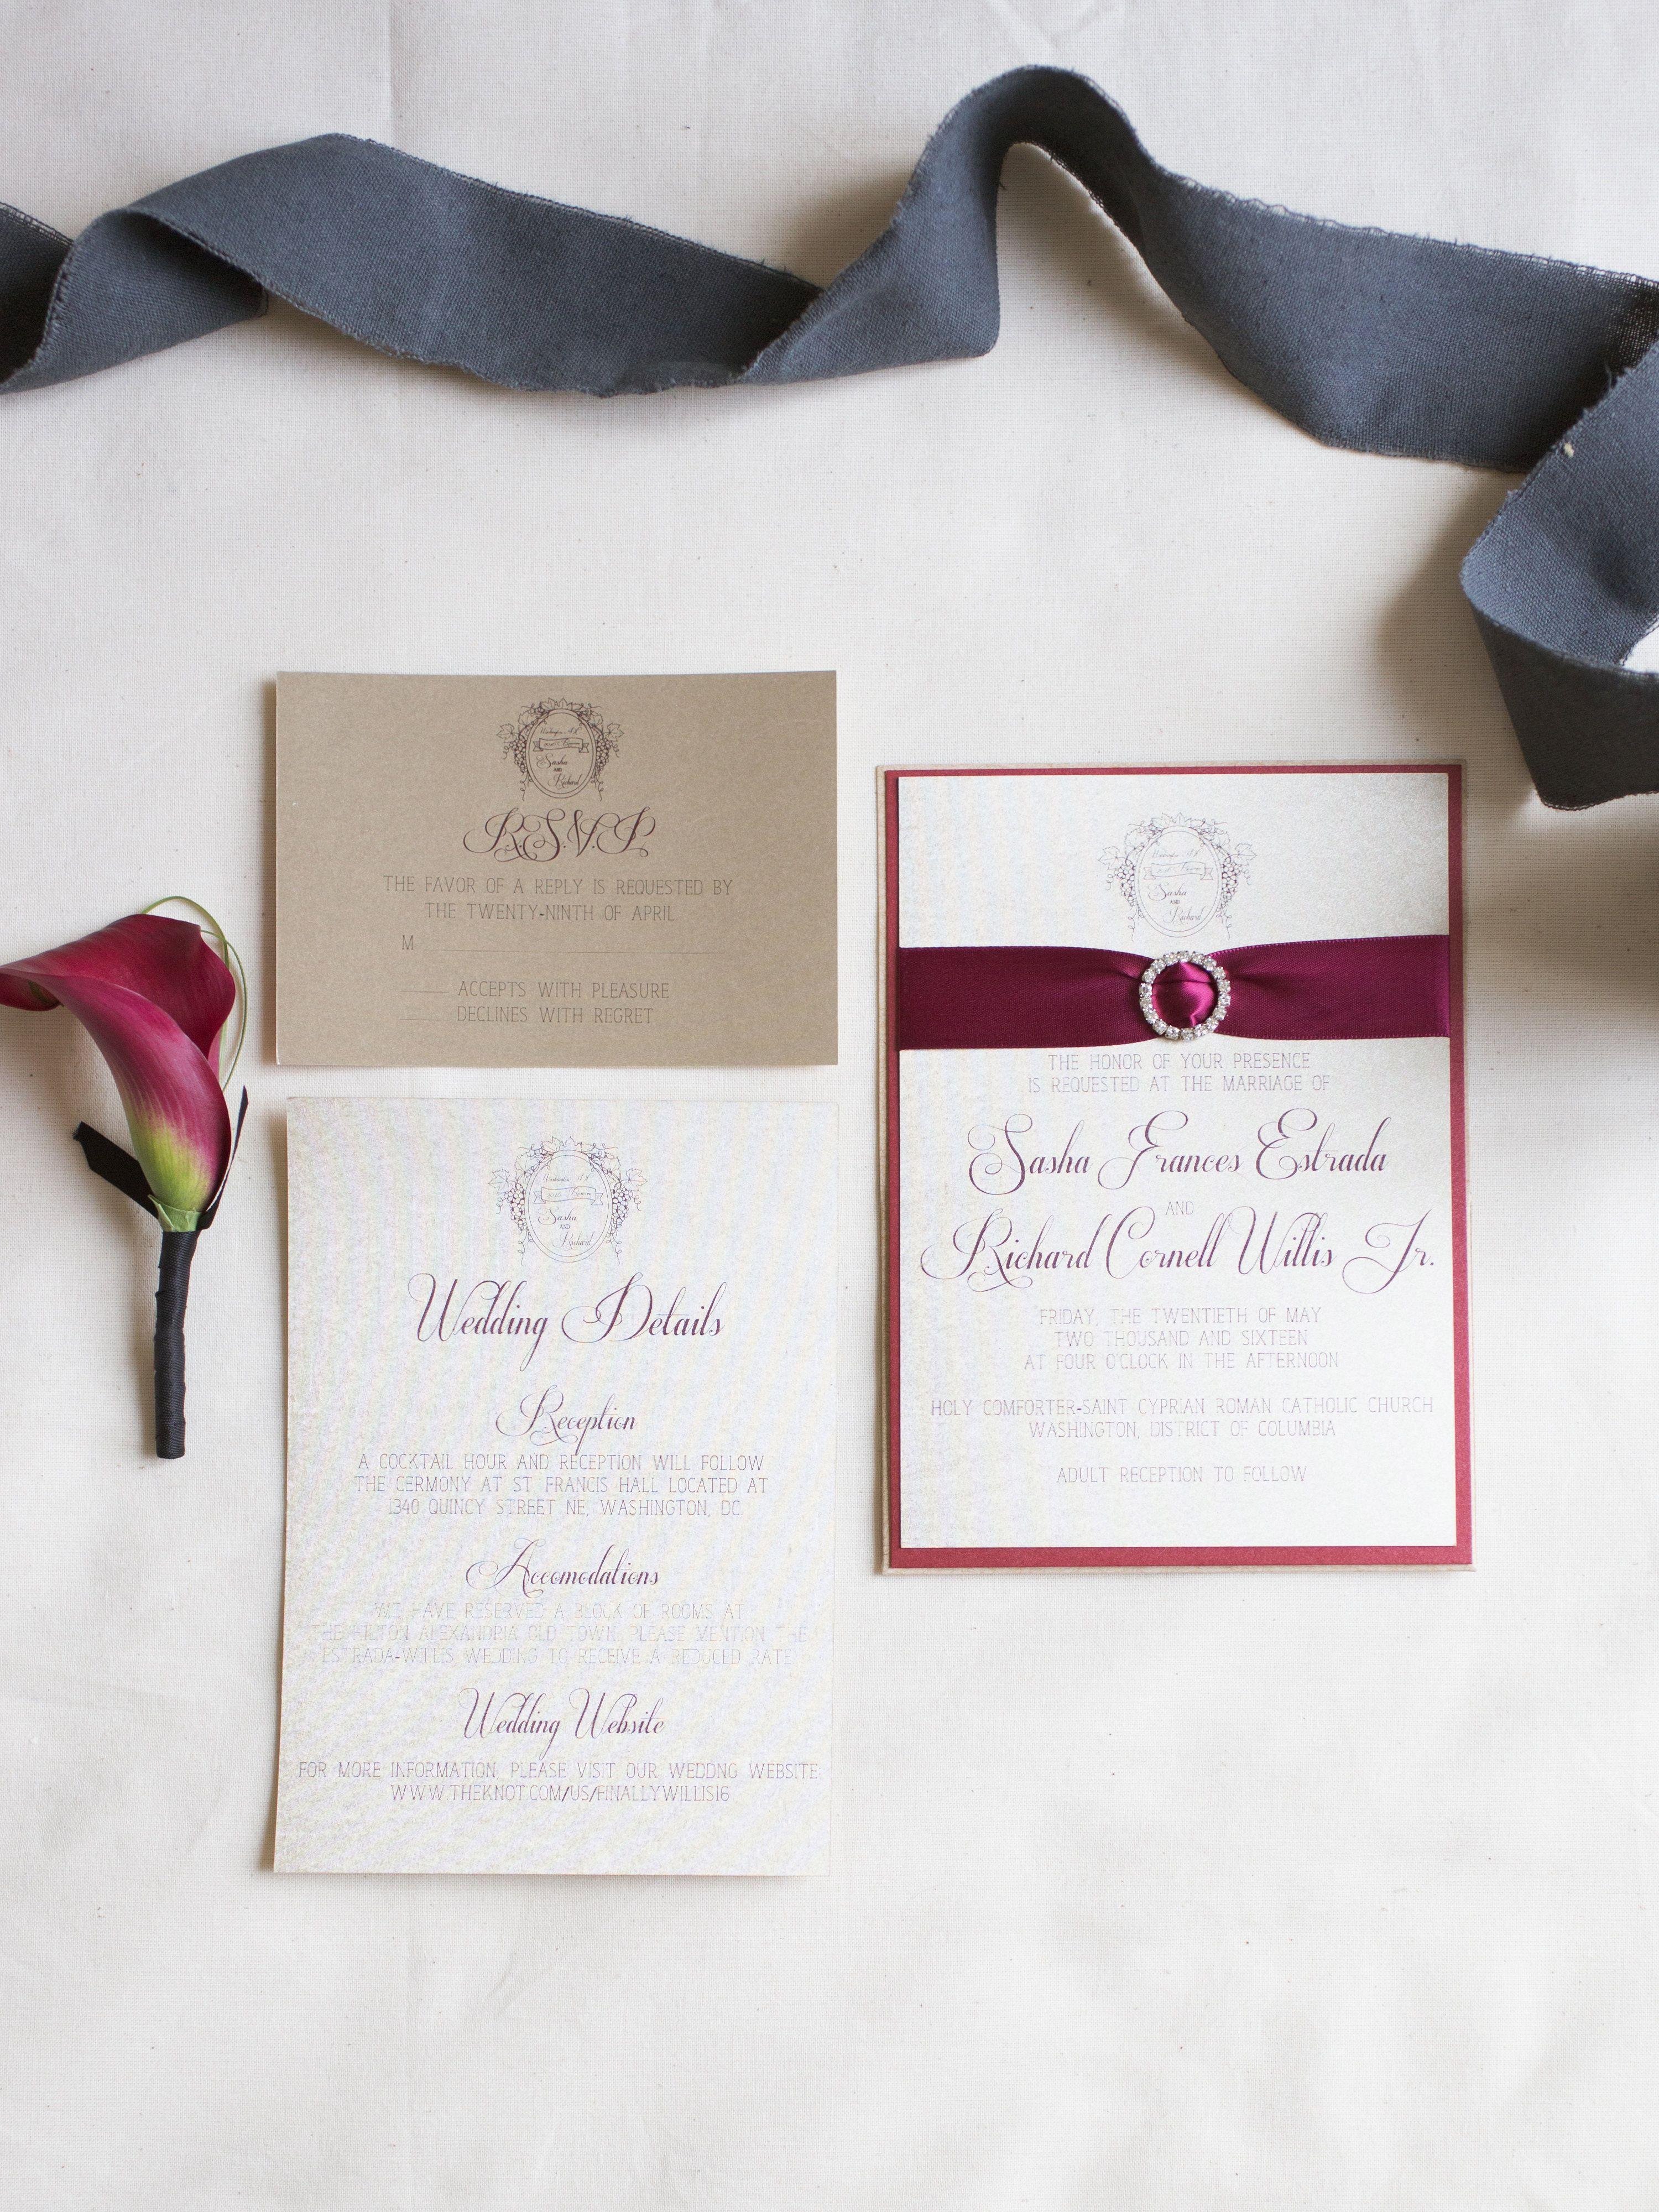 Wedding Stationery: Invitation Trends for 2017 - | Wedding and Wedding